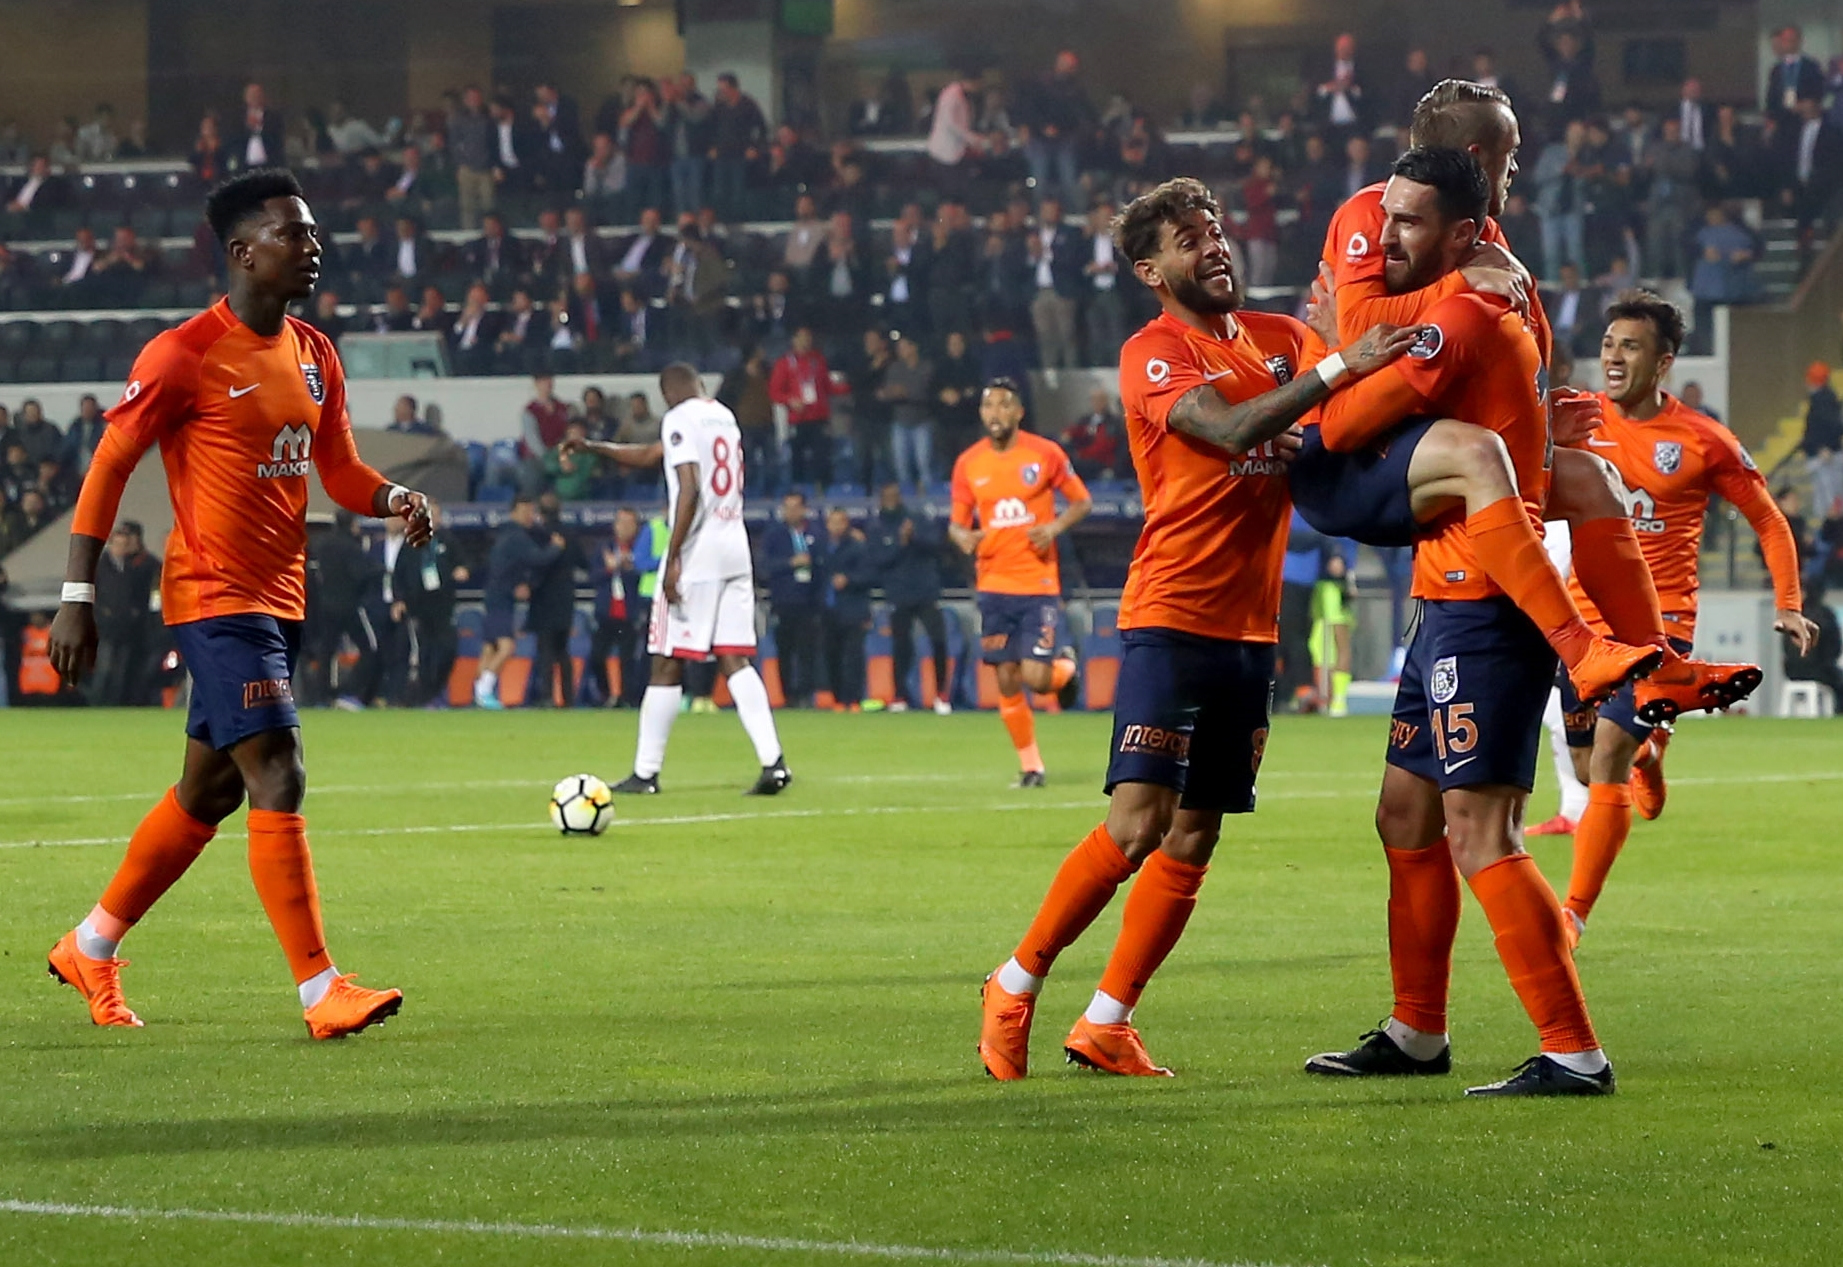 Rijad Bajic Basaksehir Sivasspor 05/04/18